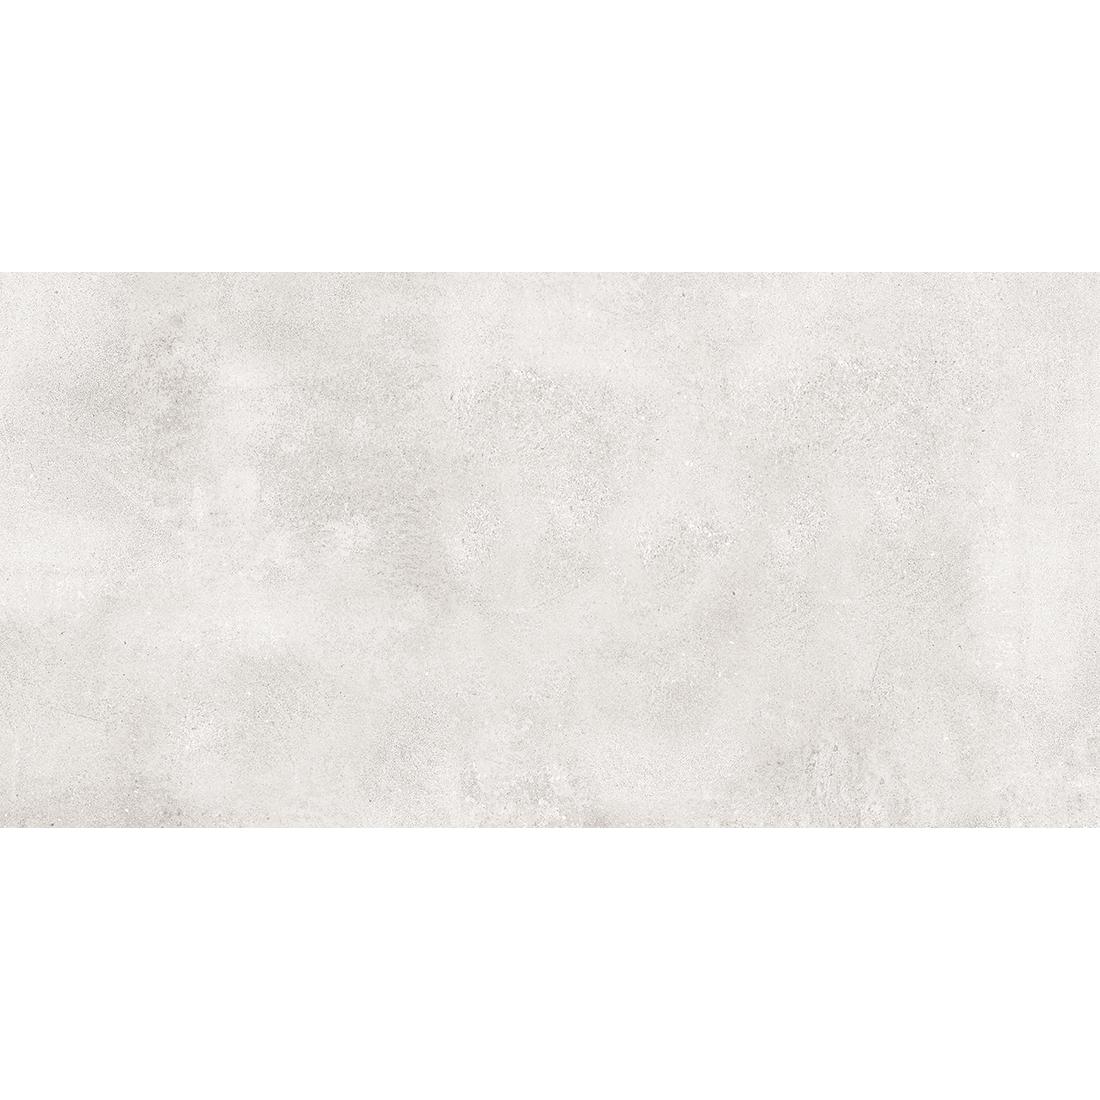 London 60x120 Bianco Gloss 1